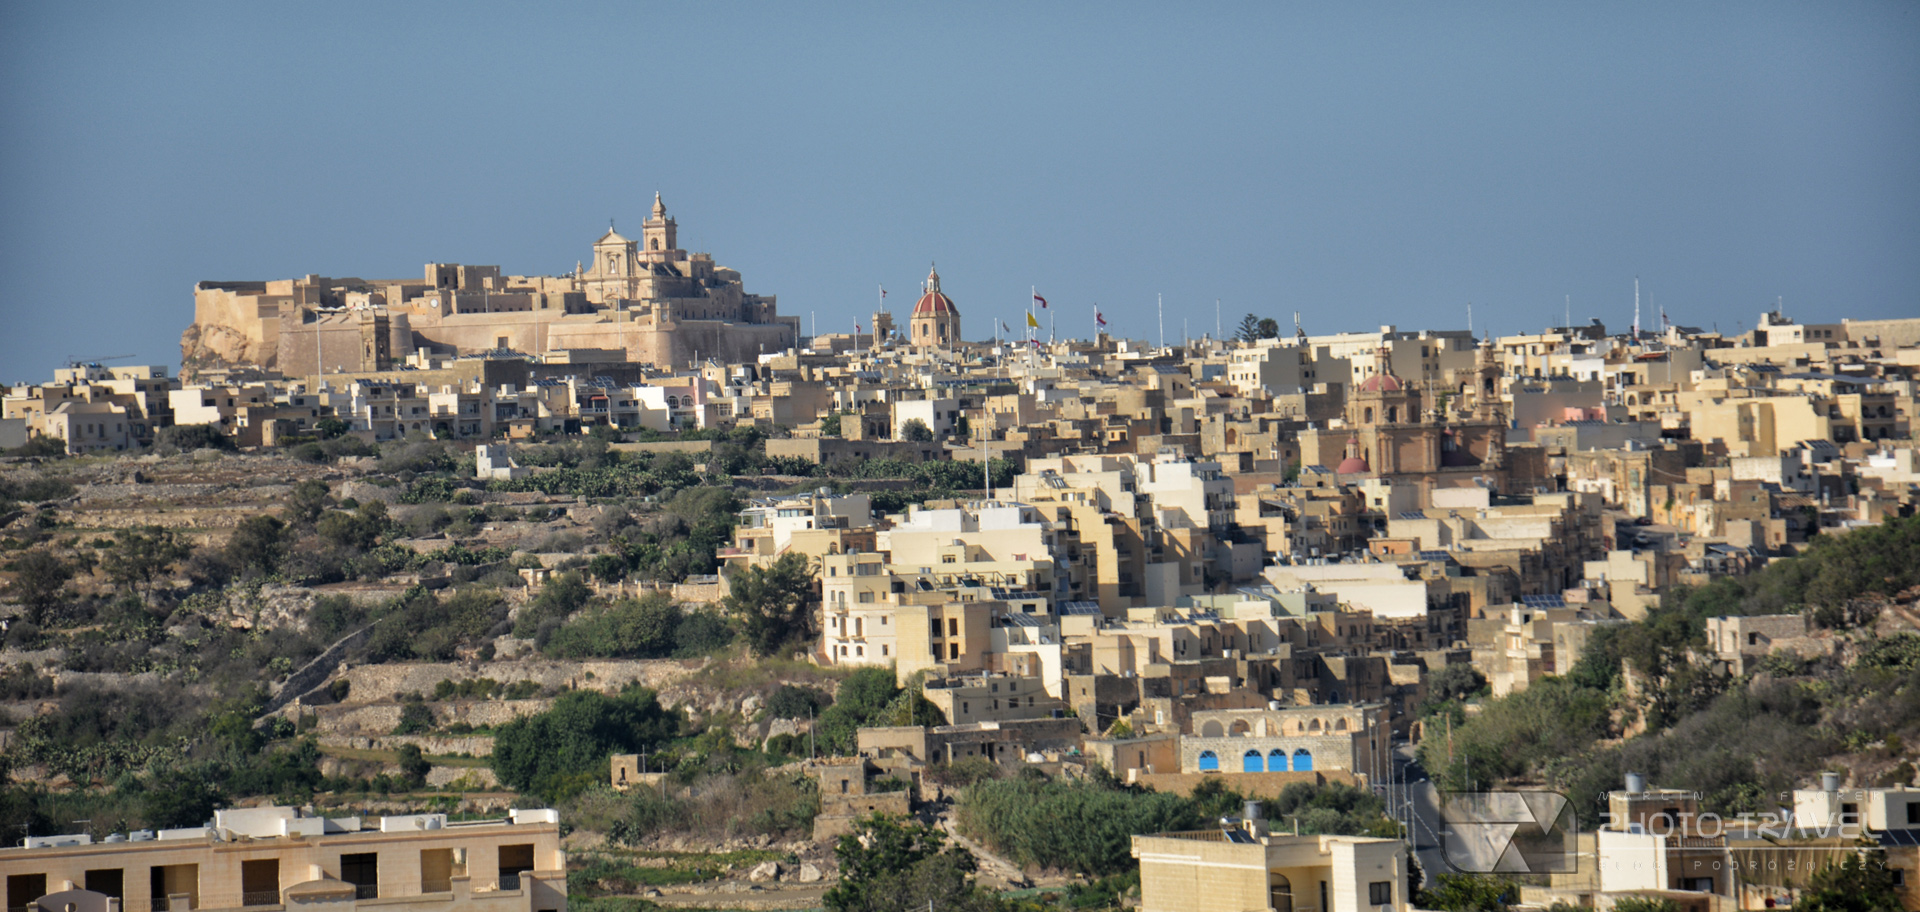 Victoria (Rabat) i Cytadela